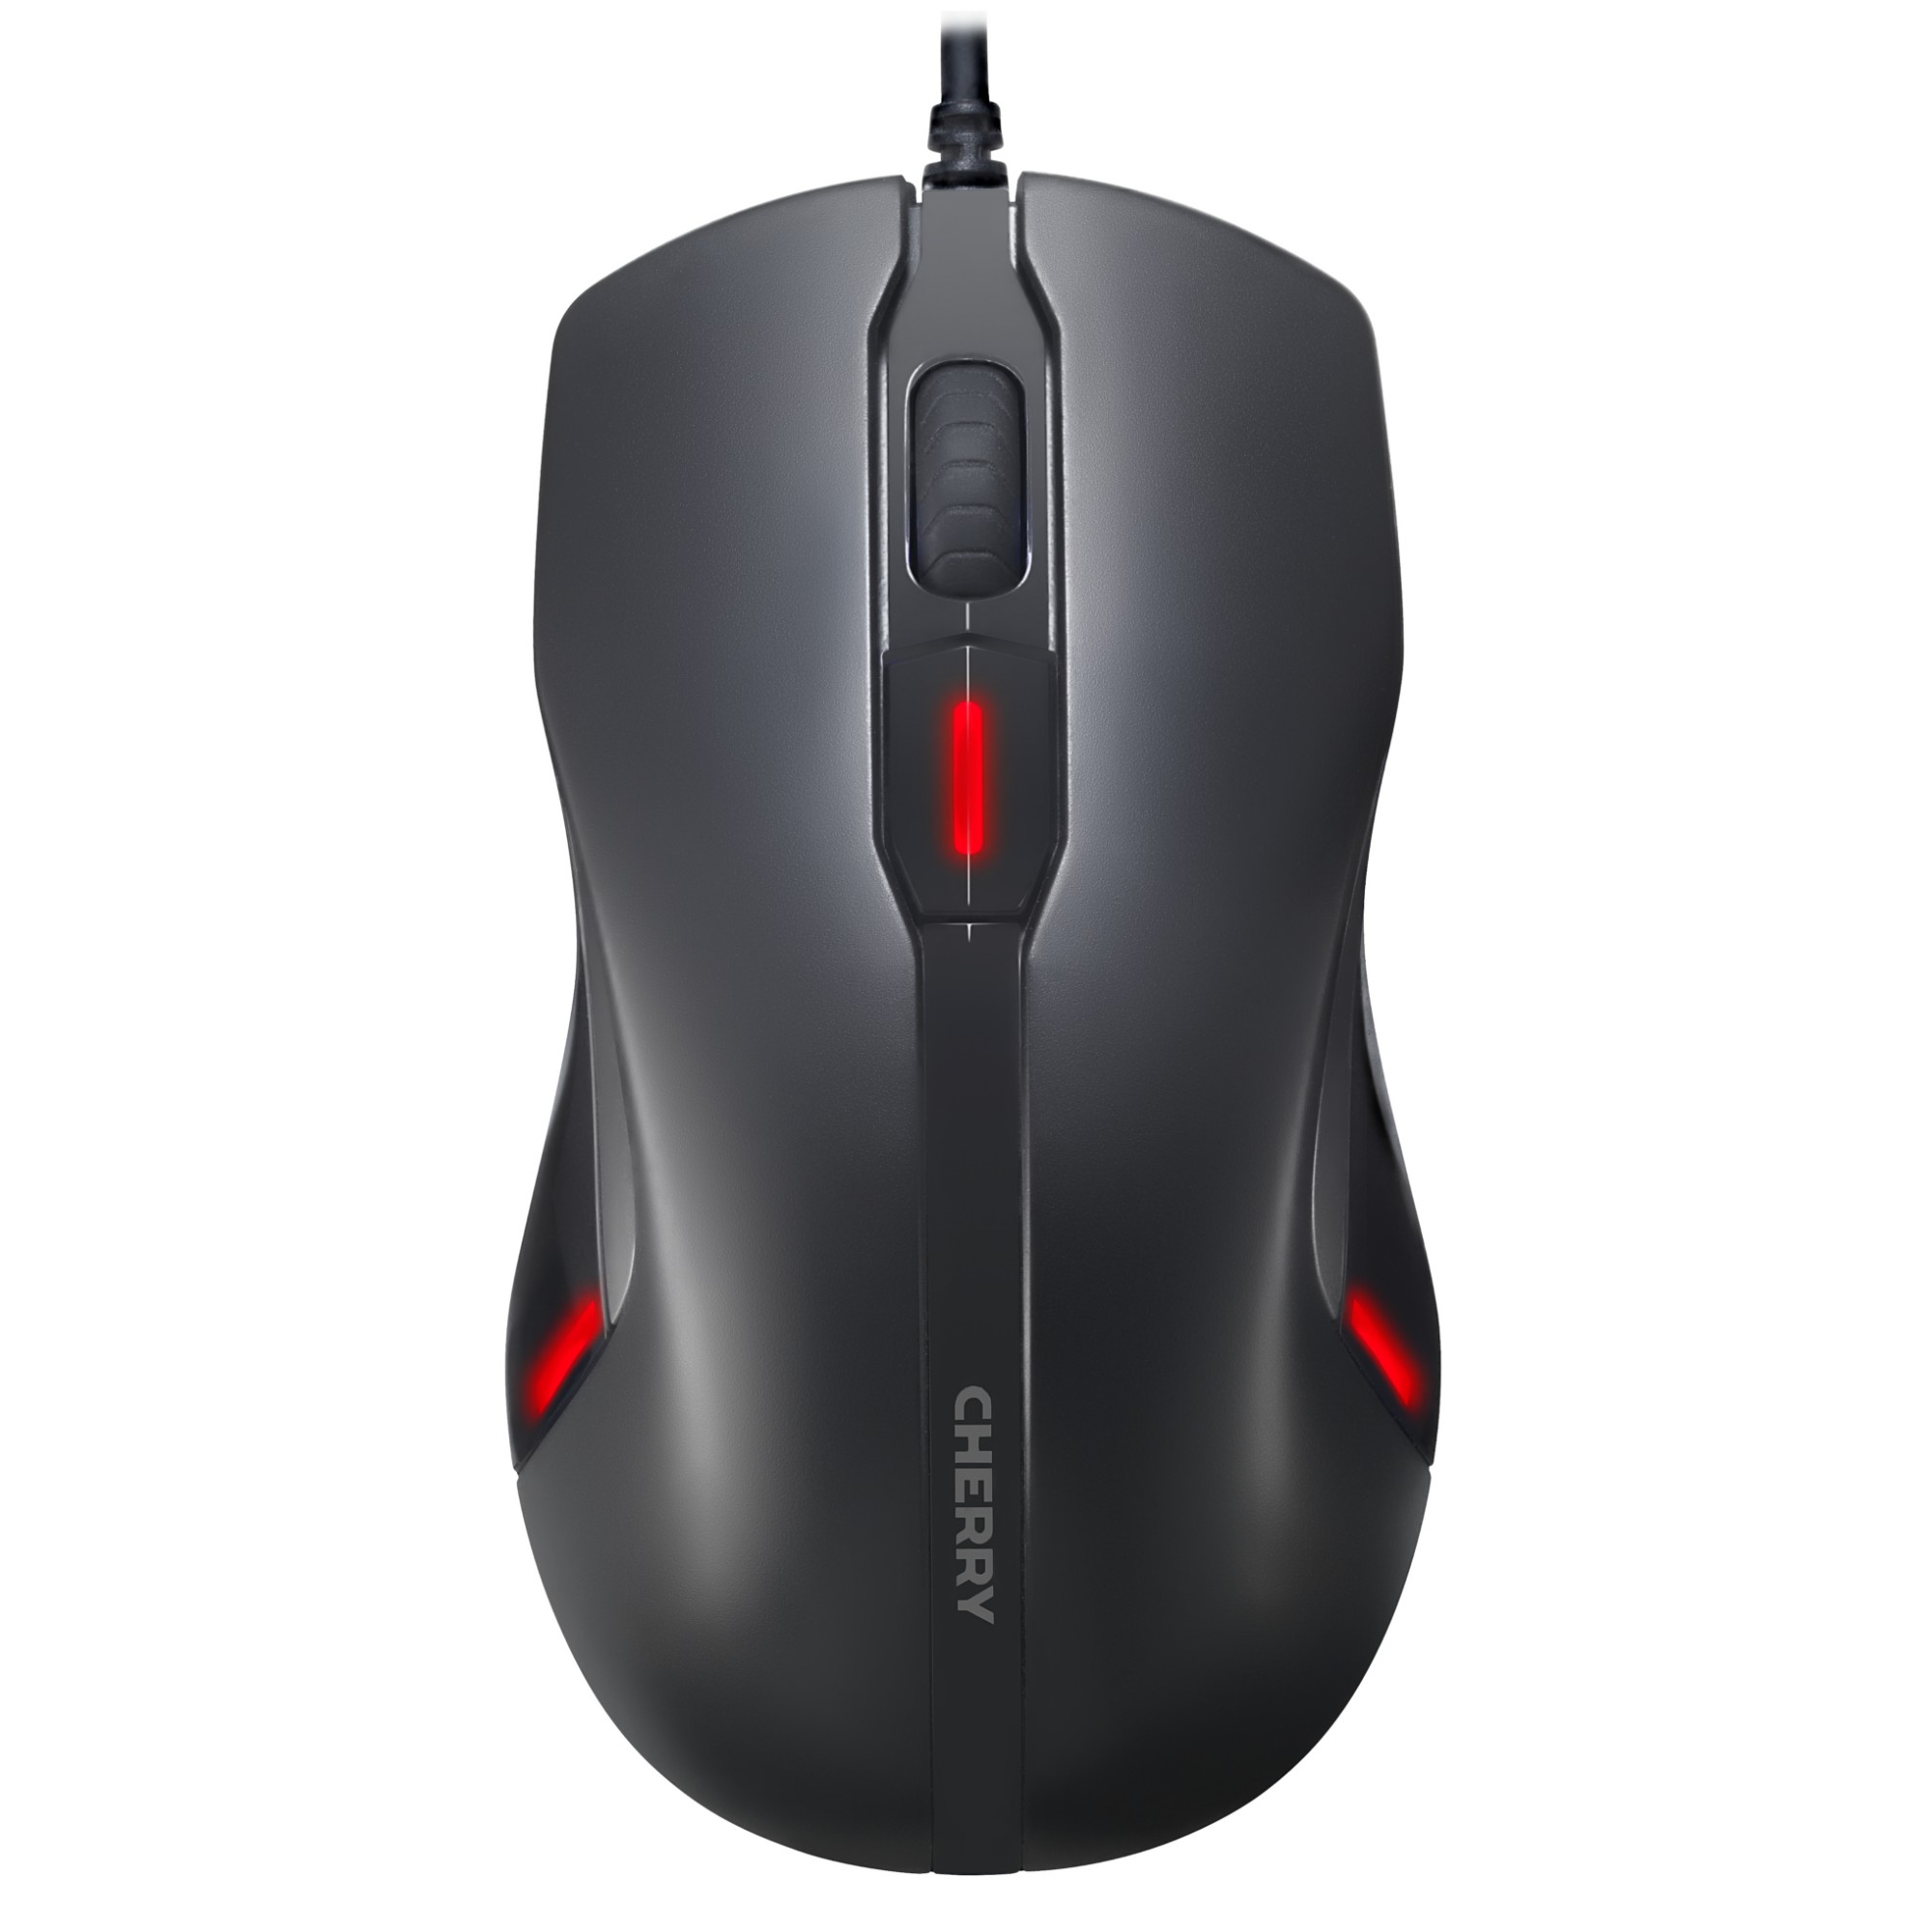 Cherry MC 4000 USB Optical 2000DPI Ambidextrous Black mice